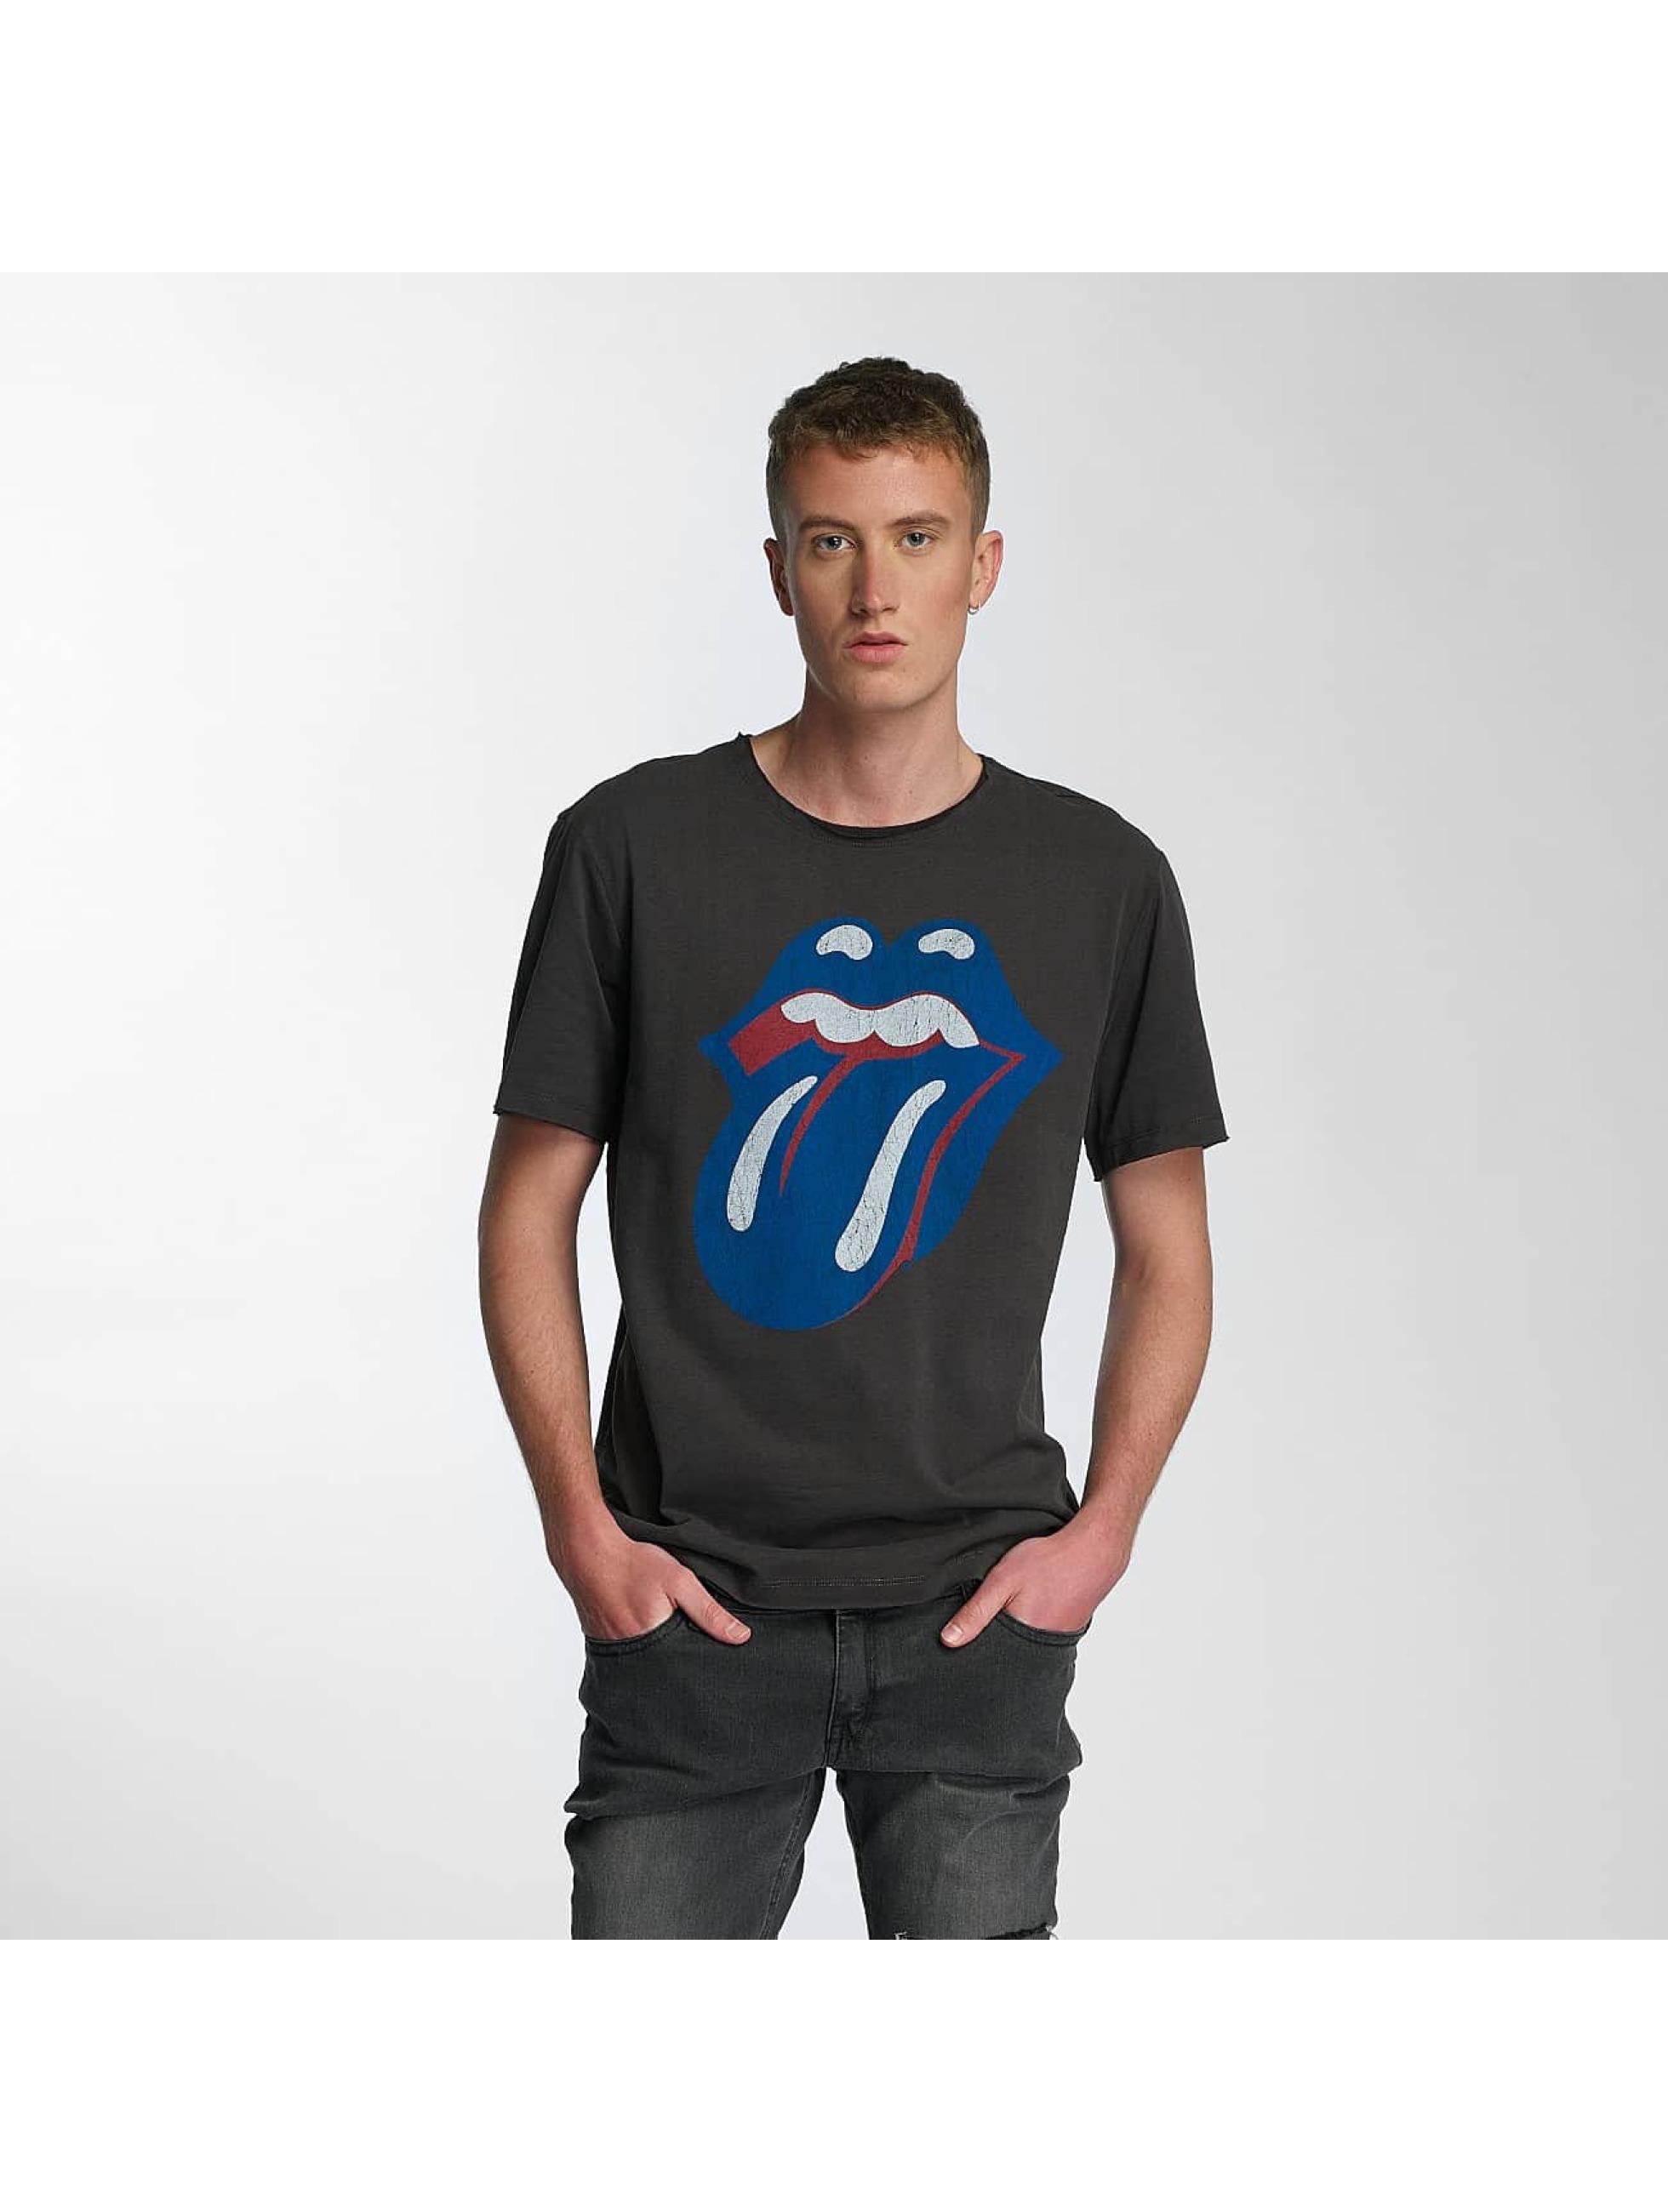 Amplified Männer T-Shirt Rolling Stones Blue und Lonesome in grau